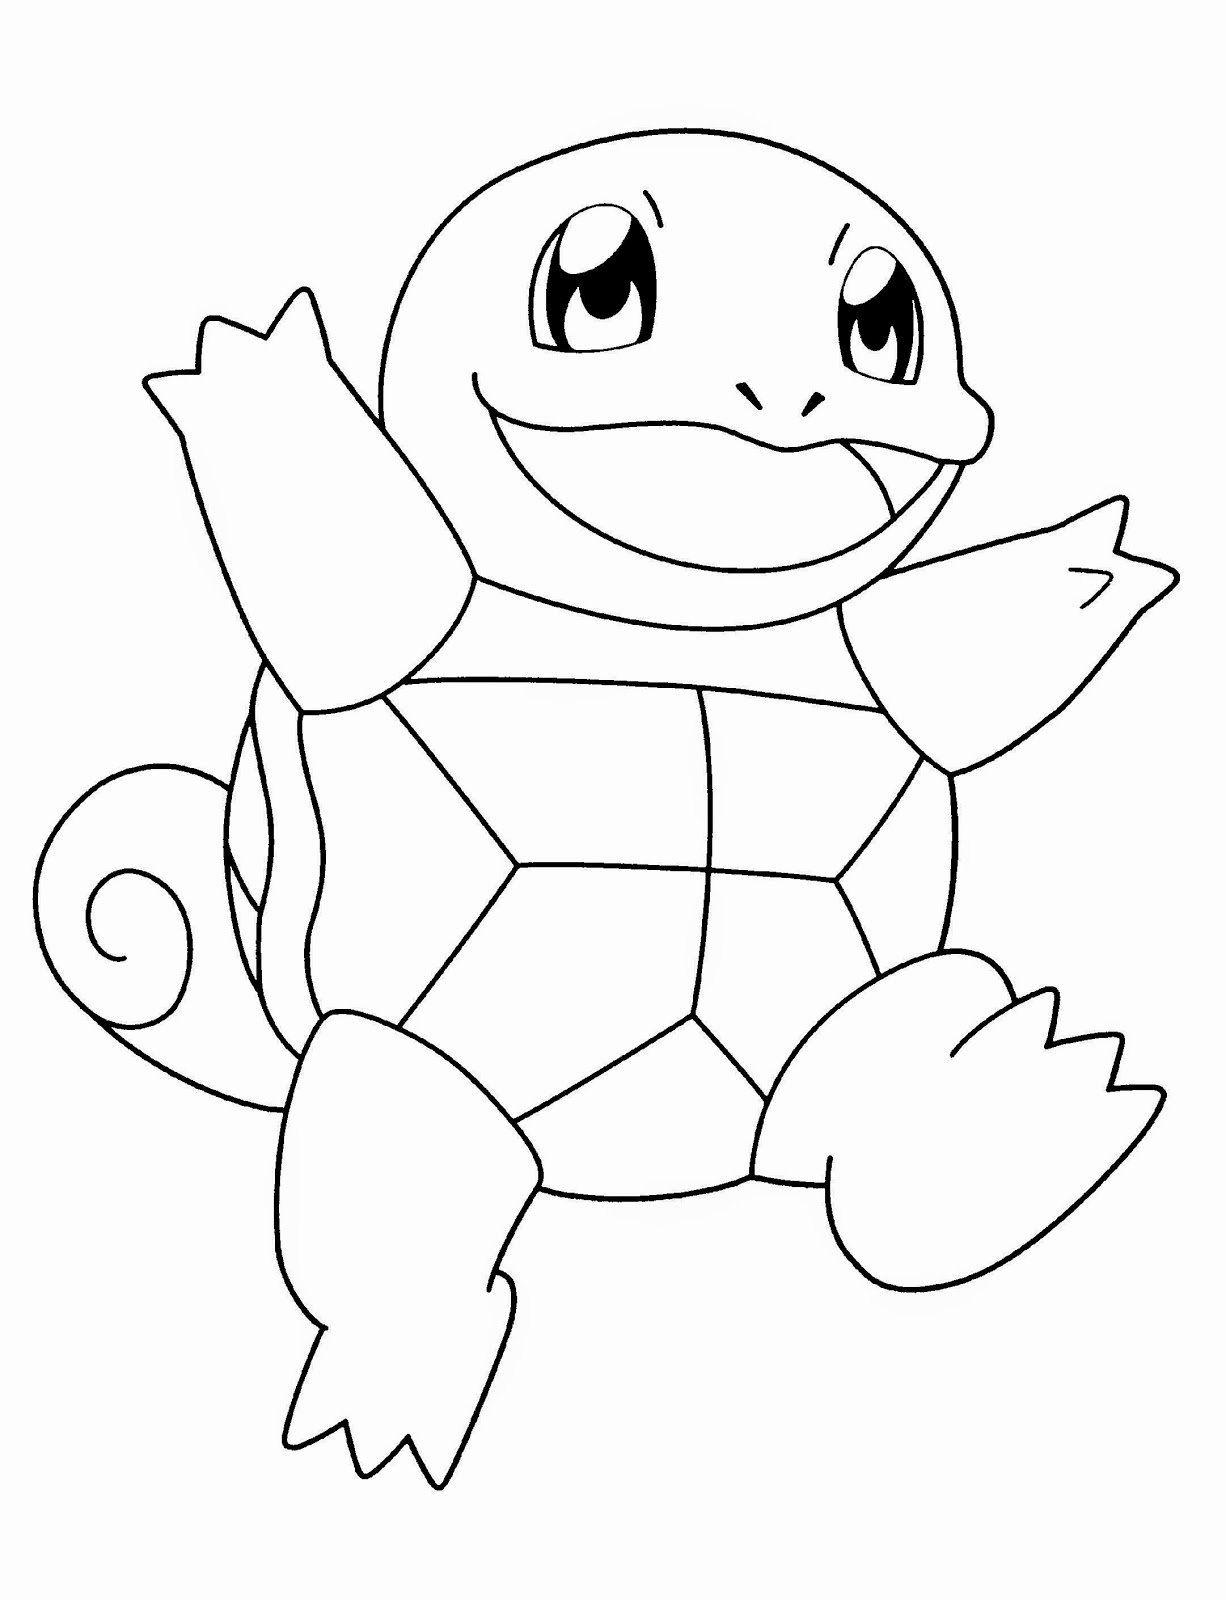 Pin By Izabella S On Drawings In 2020 Pokemon Coloring Sheets Pokemon Coloring Pages Pokemon Coloring